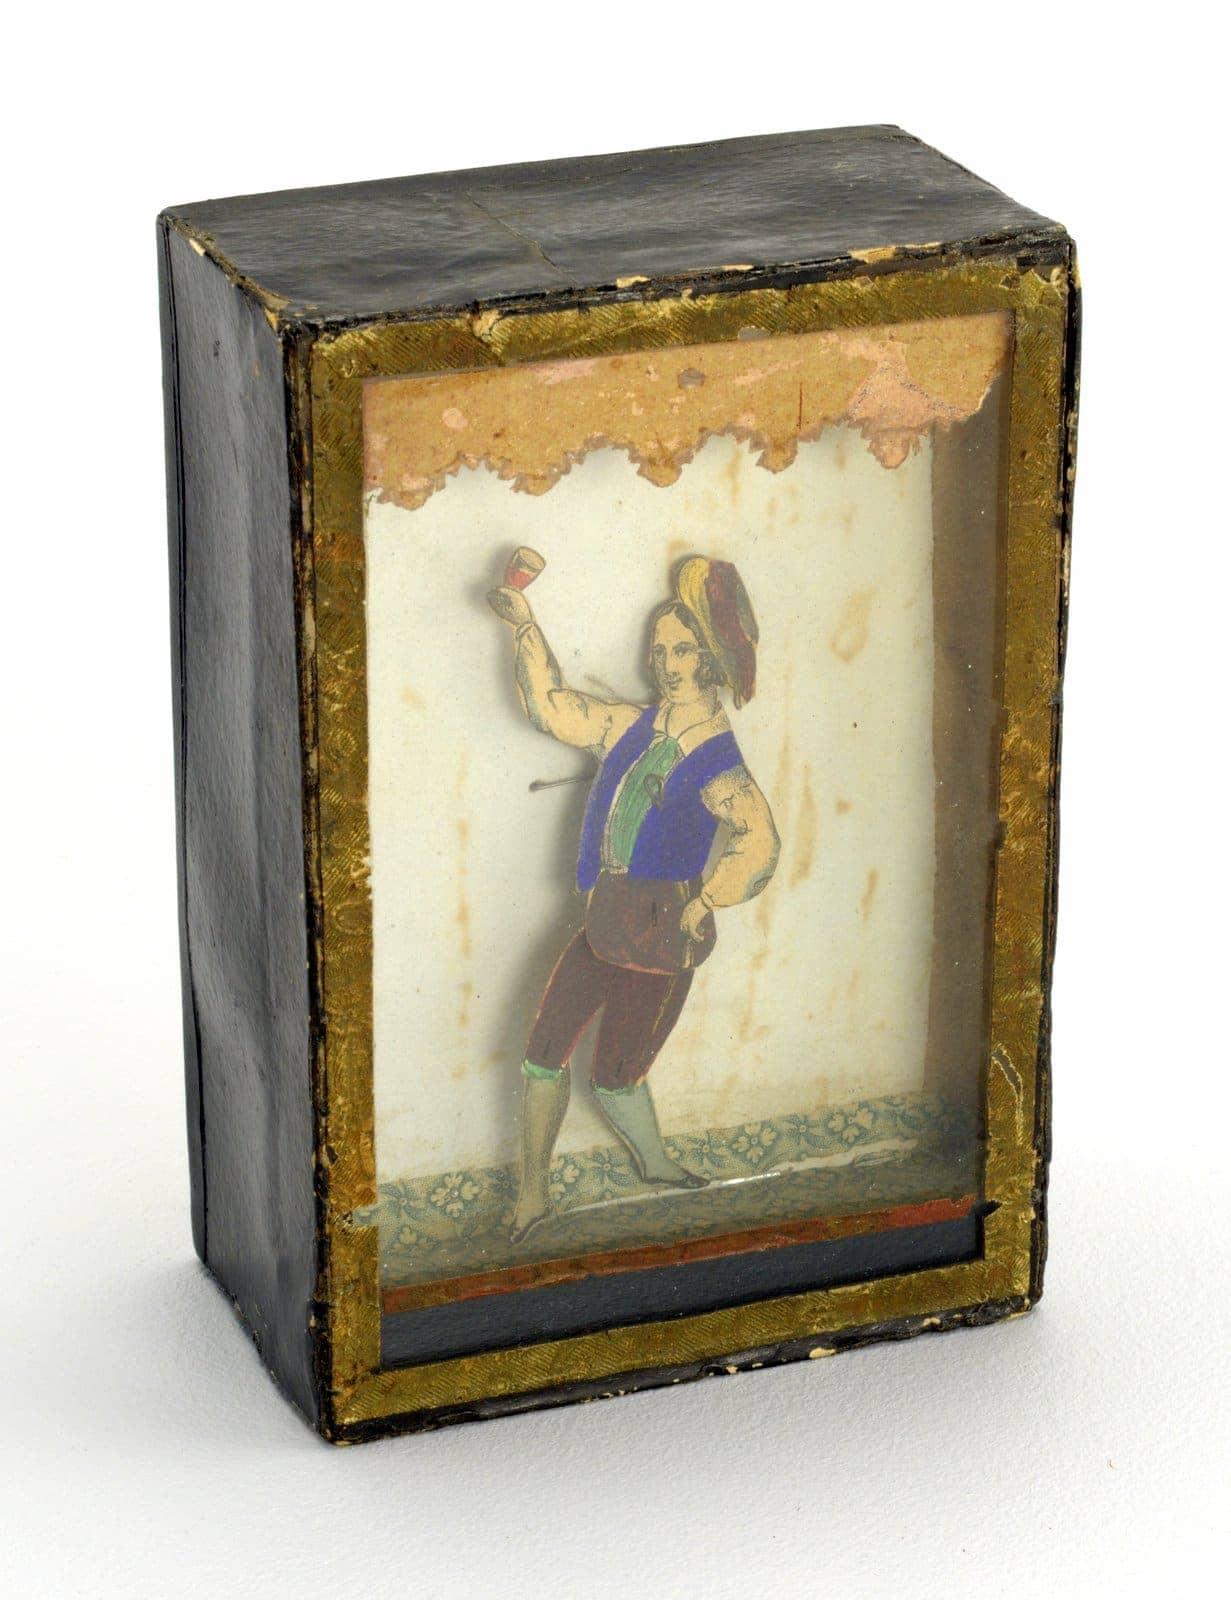 Vintage dancing man toy 1840s